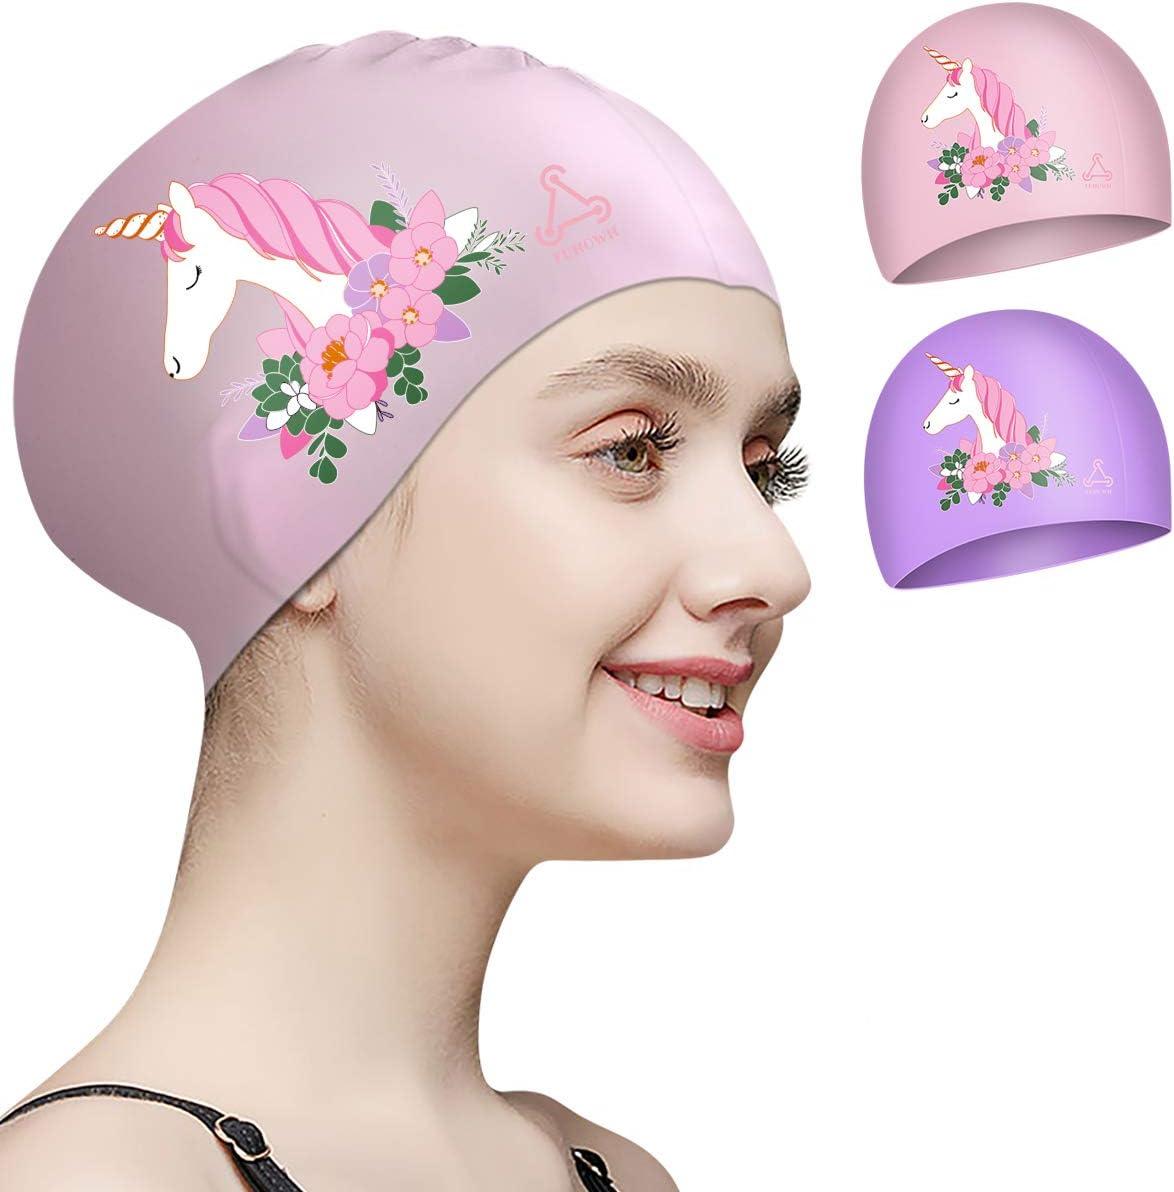 FUNOWN Swim Caps for Women Swimming Cap 3D Ergonomic Design Comfortable Durable Ear Protection for Women Kids Men Adults Boys Girls for Long or Short Hair with Unicorn Design